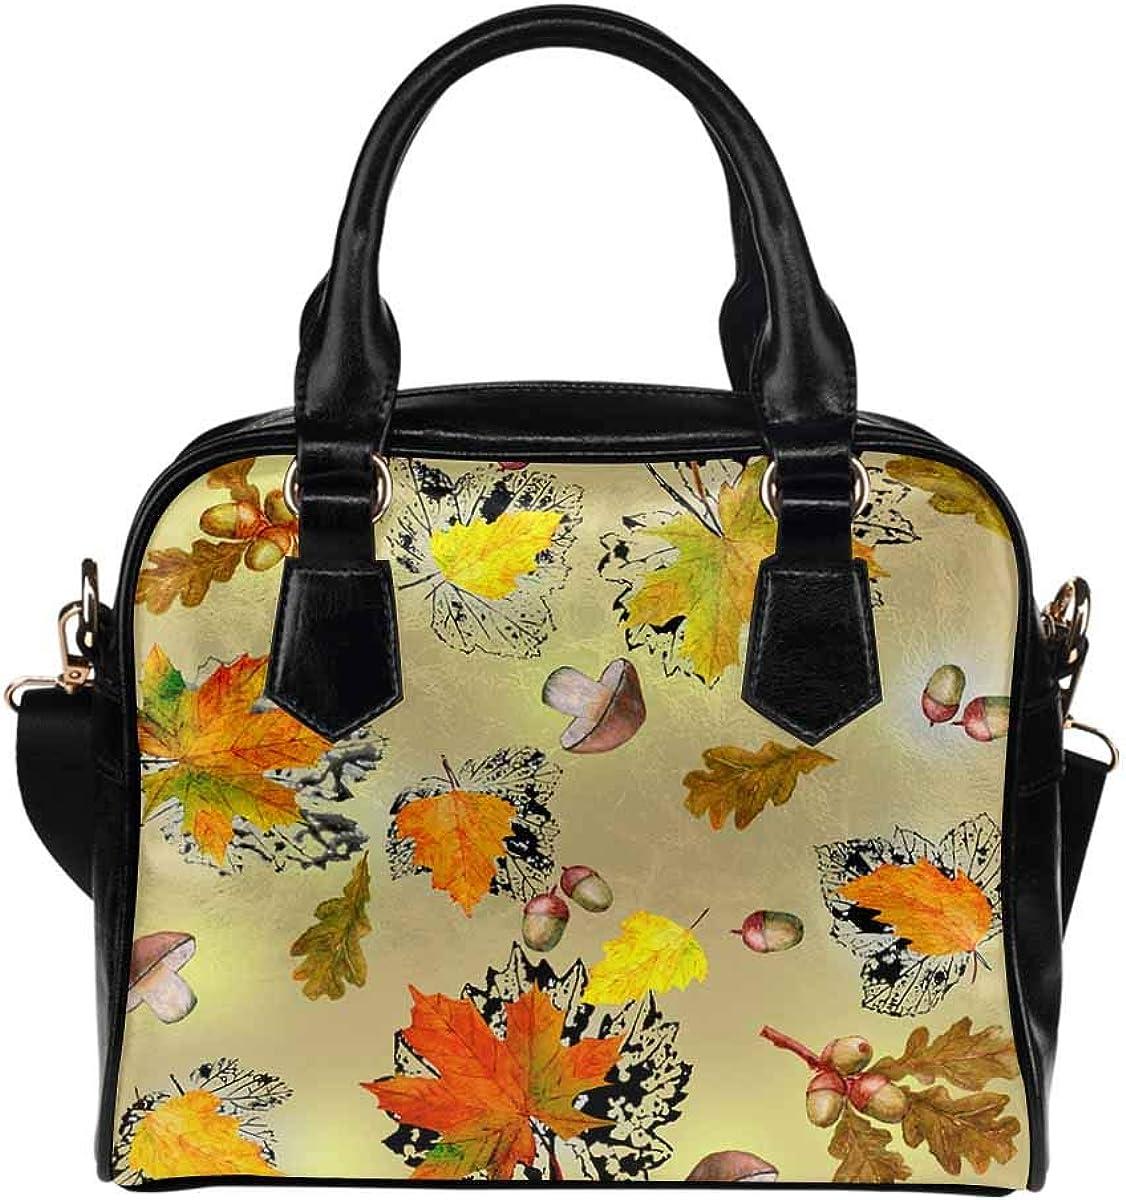 INTERESTPRINT Autumn Maple Leaf, Acorn Crossbody Purse Bags for Women Shoulder Bag